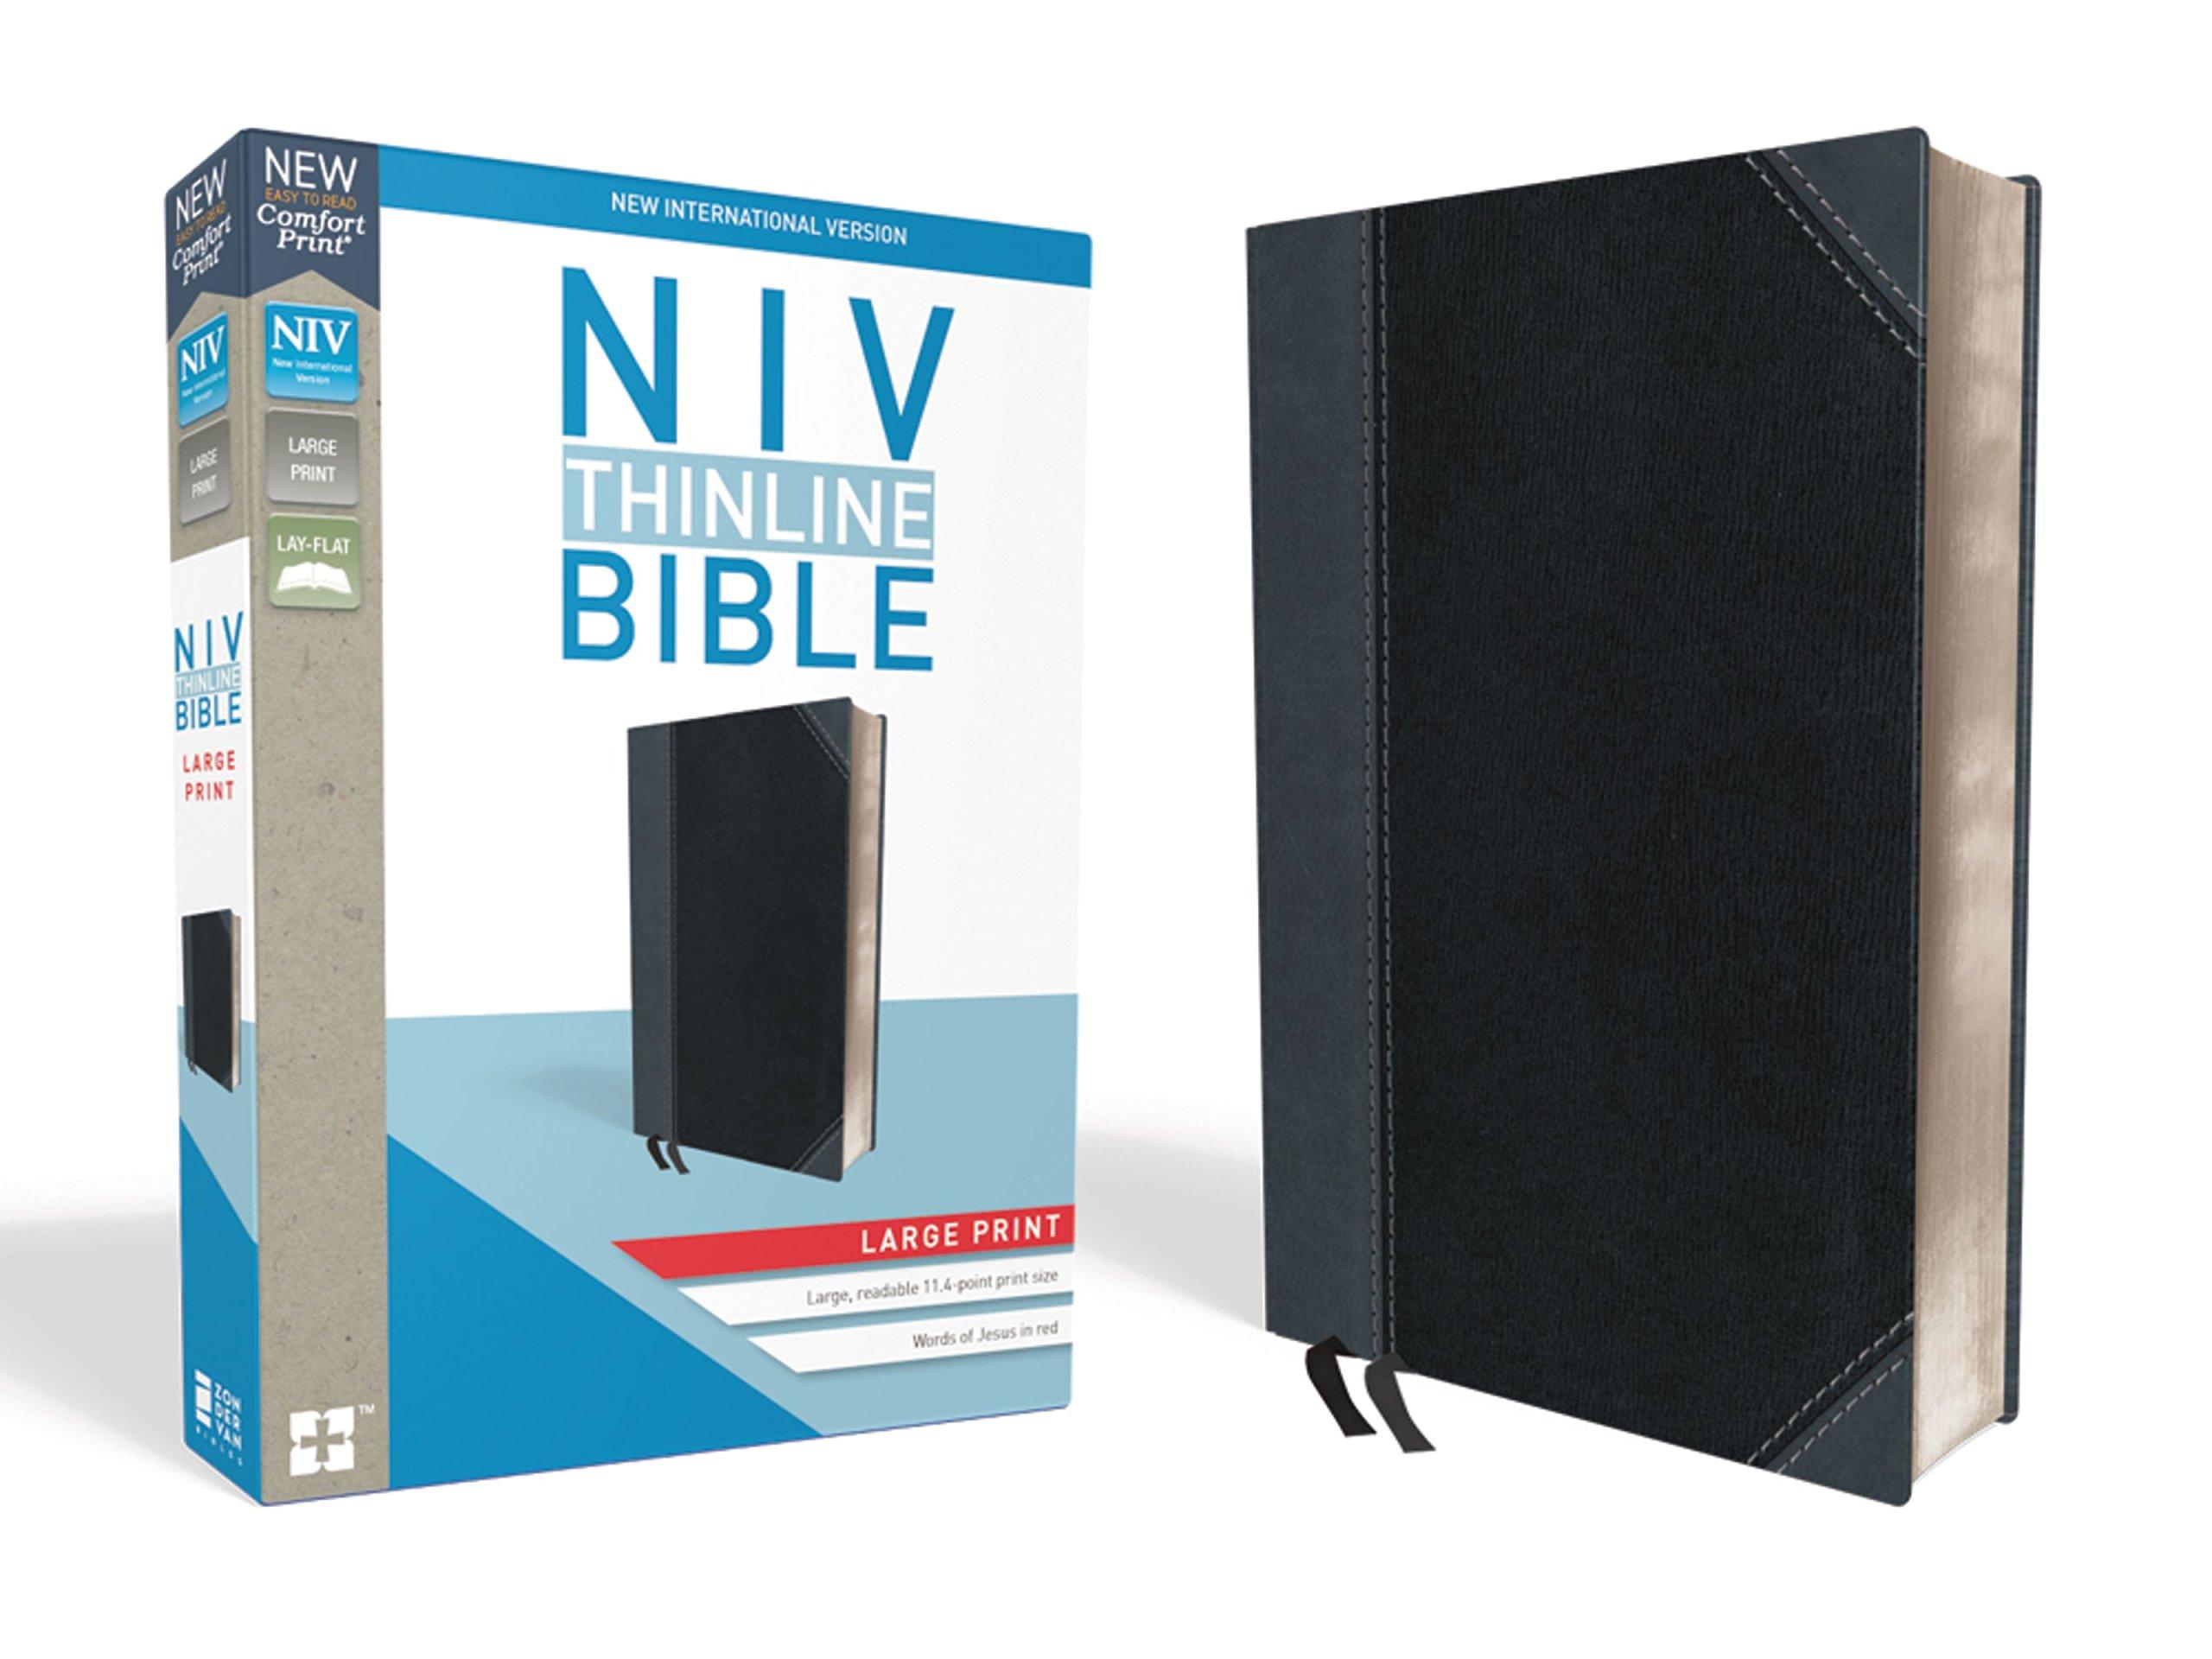 NIV, Thinline Bible, Large Print, Leathersoft, Black/Gray, Red Letter Edition, Comfort Print pdf epub